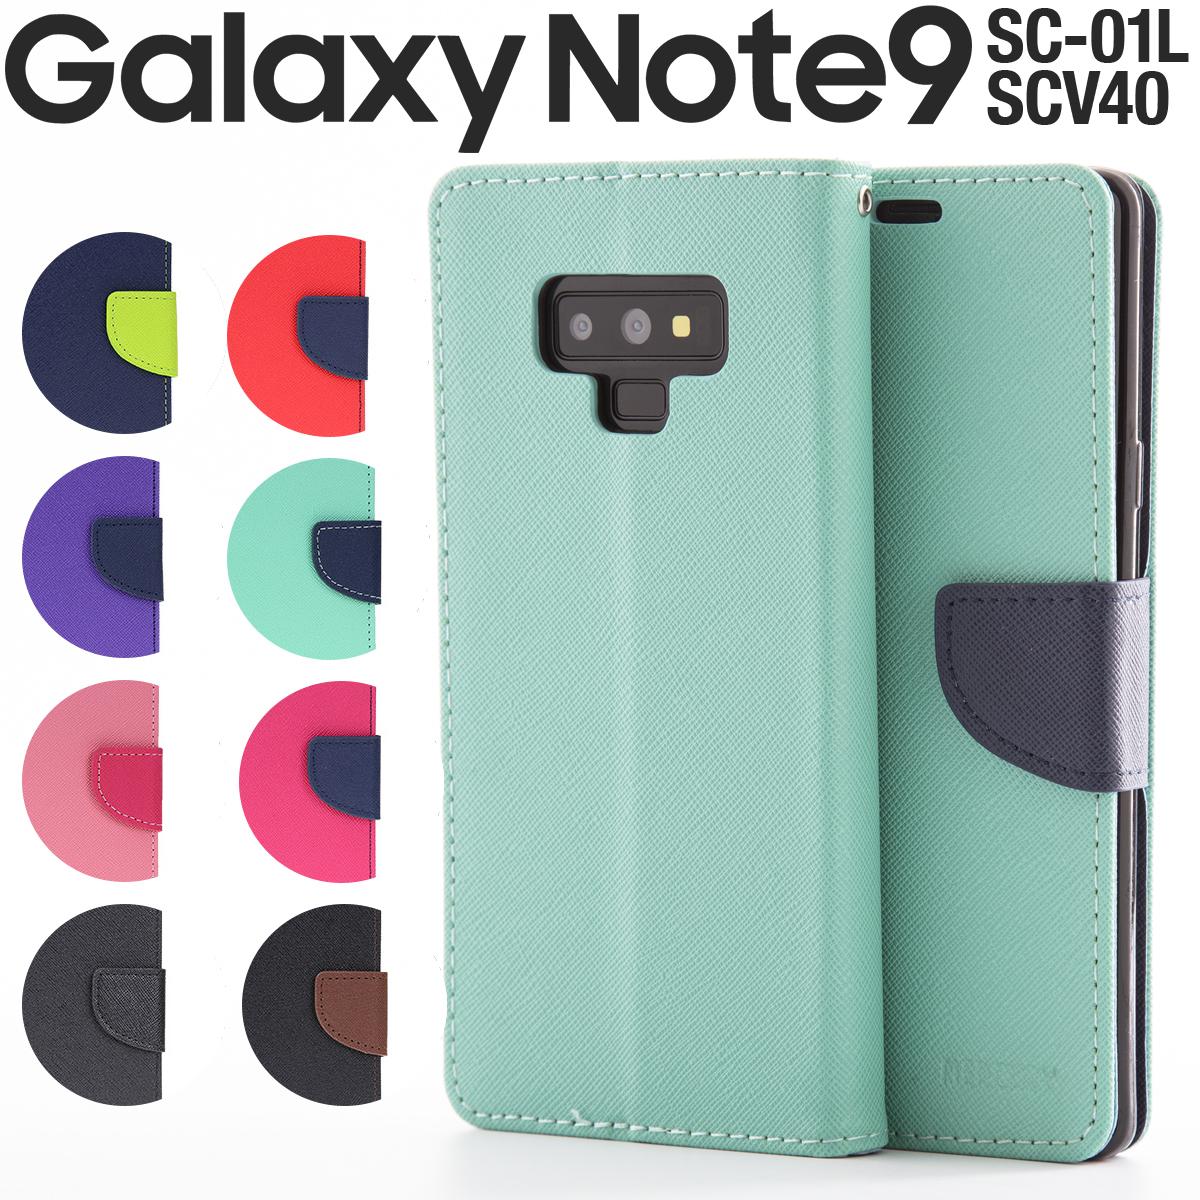 Galaxy Note9 SC-01L SCV40 コンビネーションカラー手帳型ケース